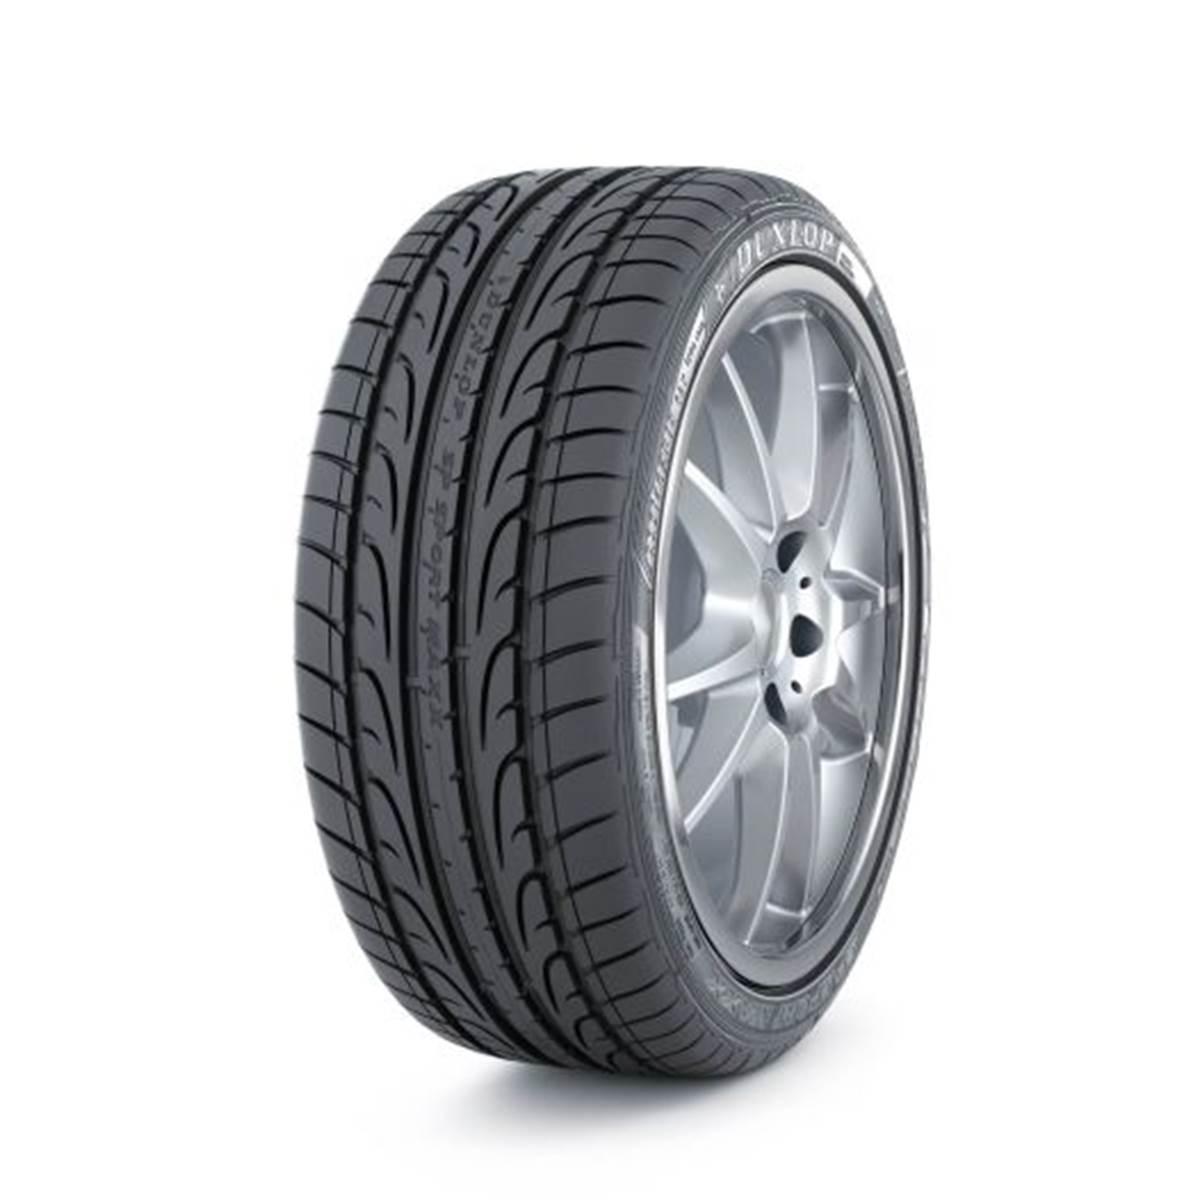 Pneu 4X4 Dunlop 275/40R21 107Y Sp Sport Maxx XL